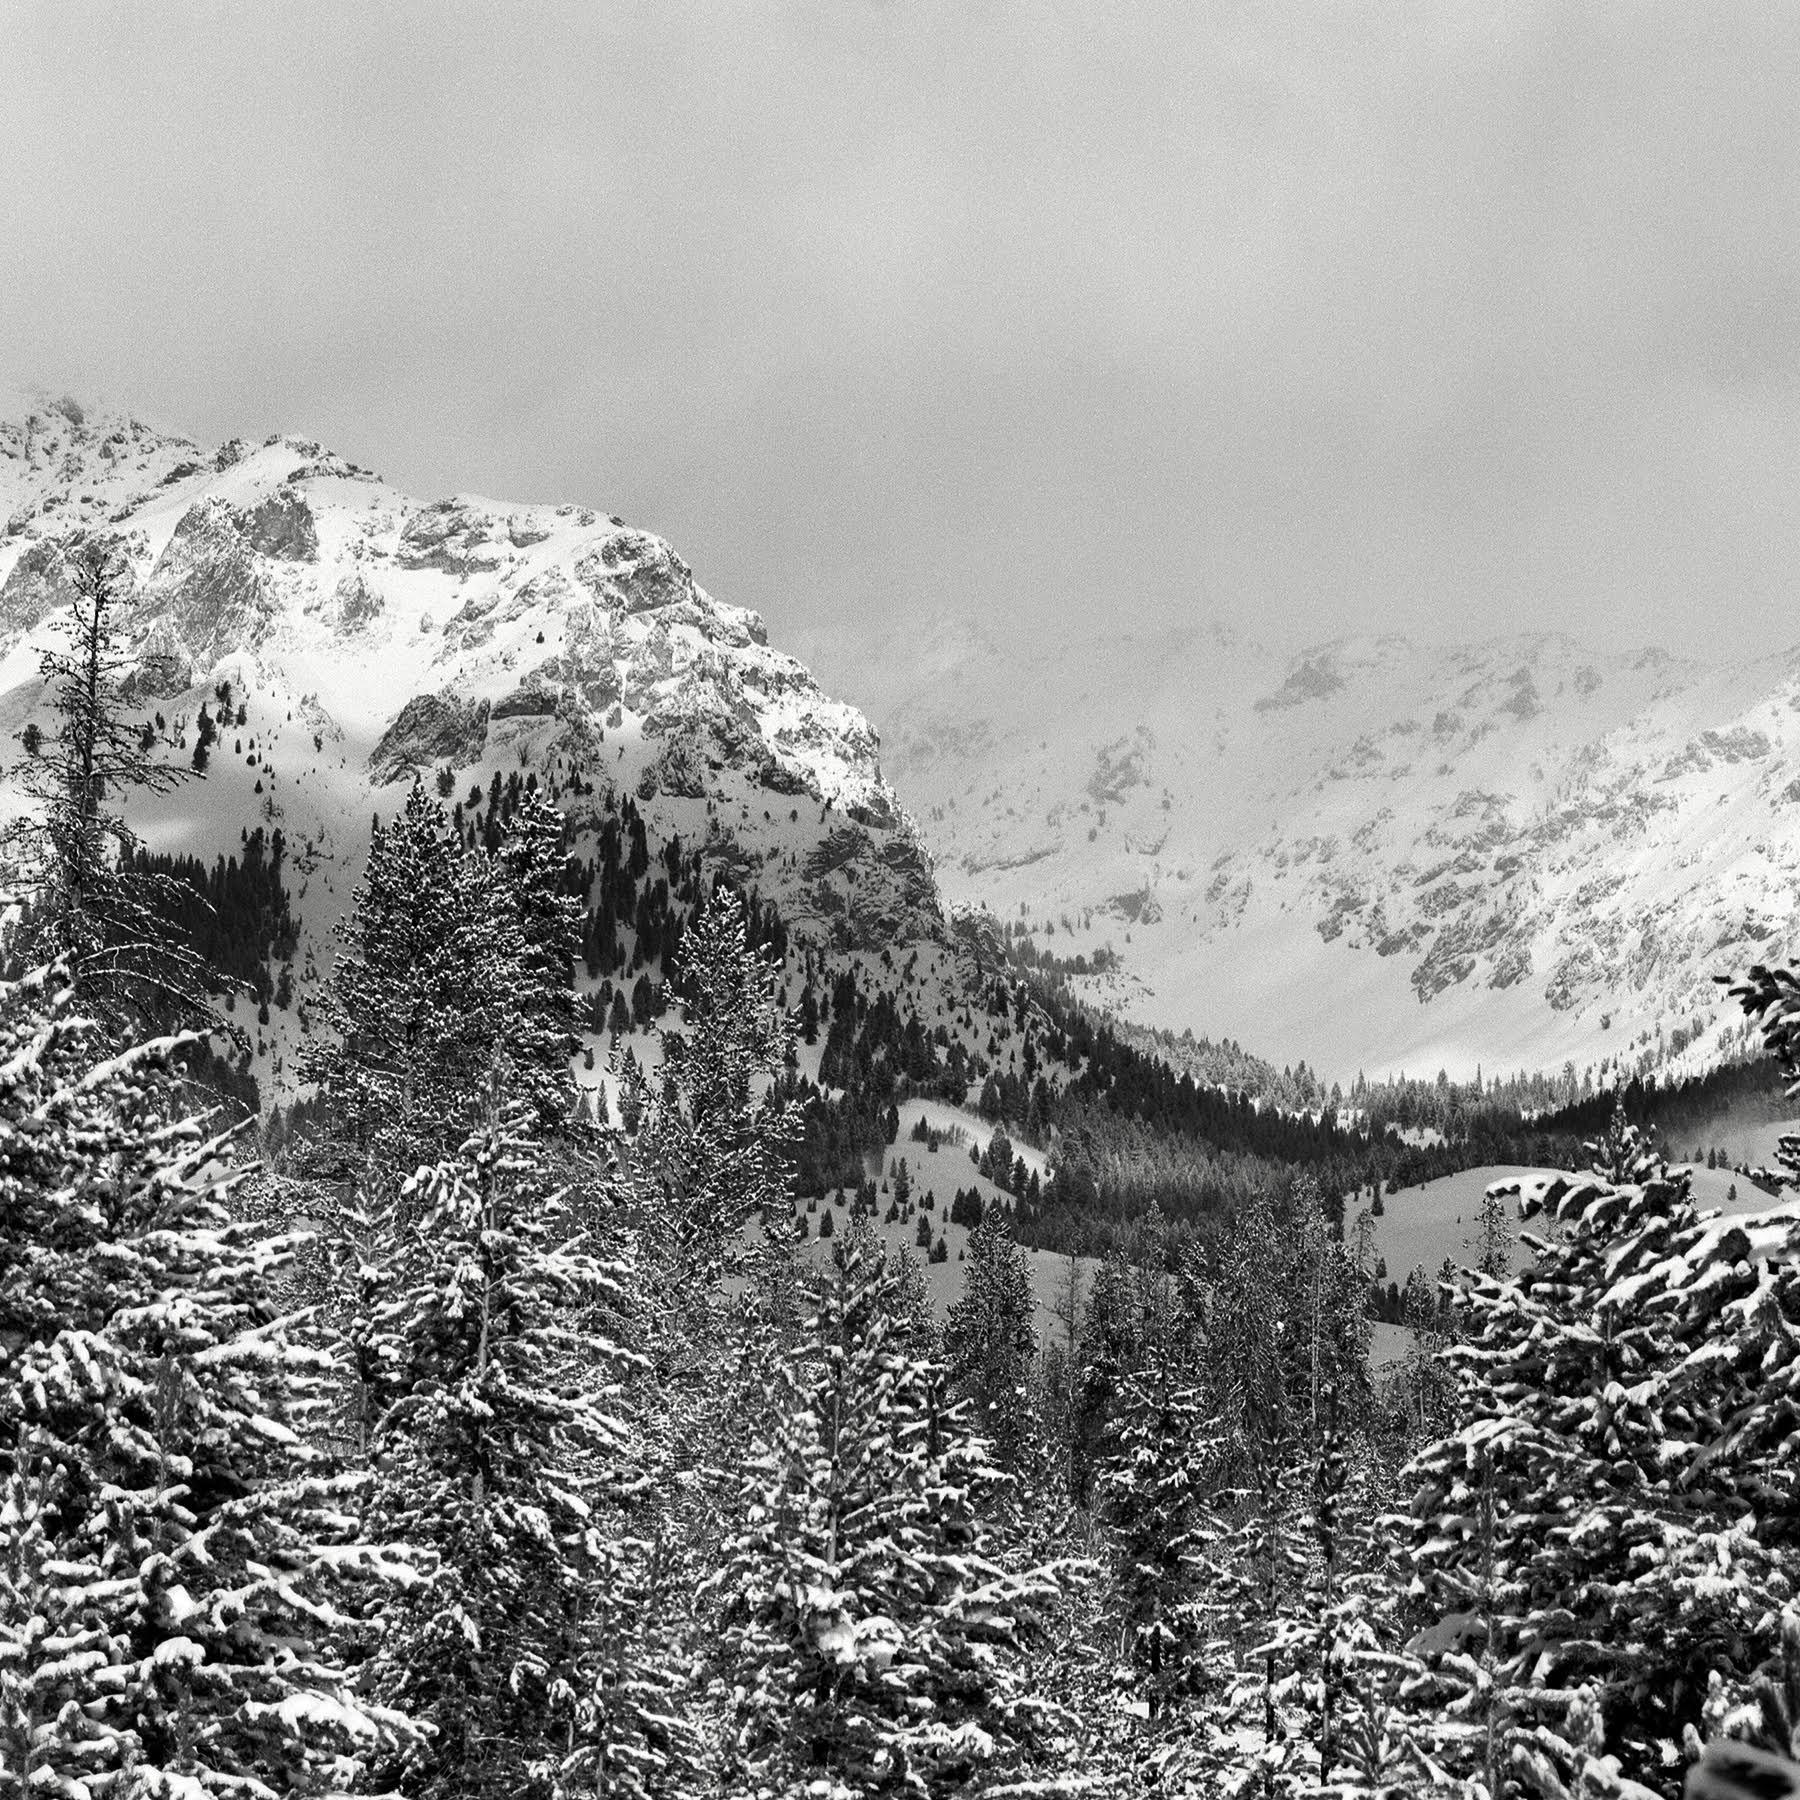 Boulders_snow…Dec. 2002 Rolleiflex 6008i, 180mm Tele-Zener, Ilford XP-2 super